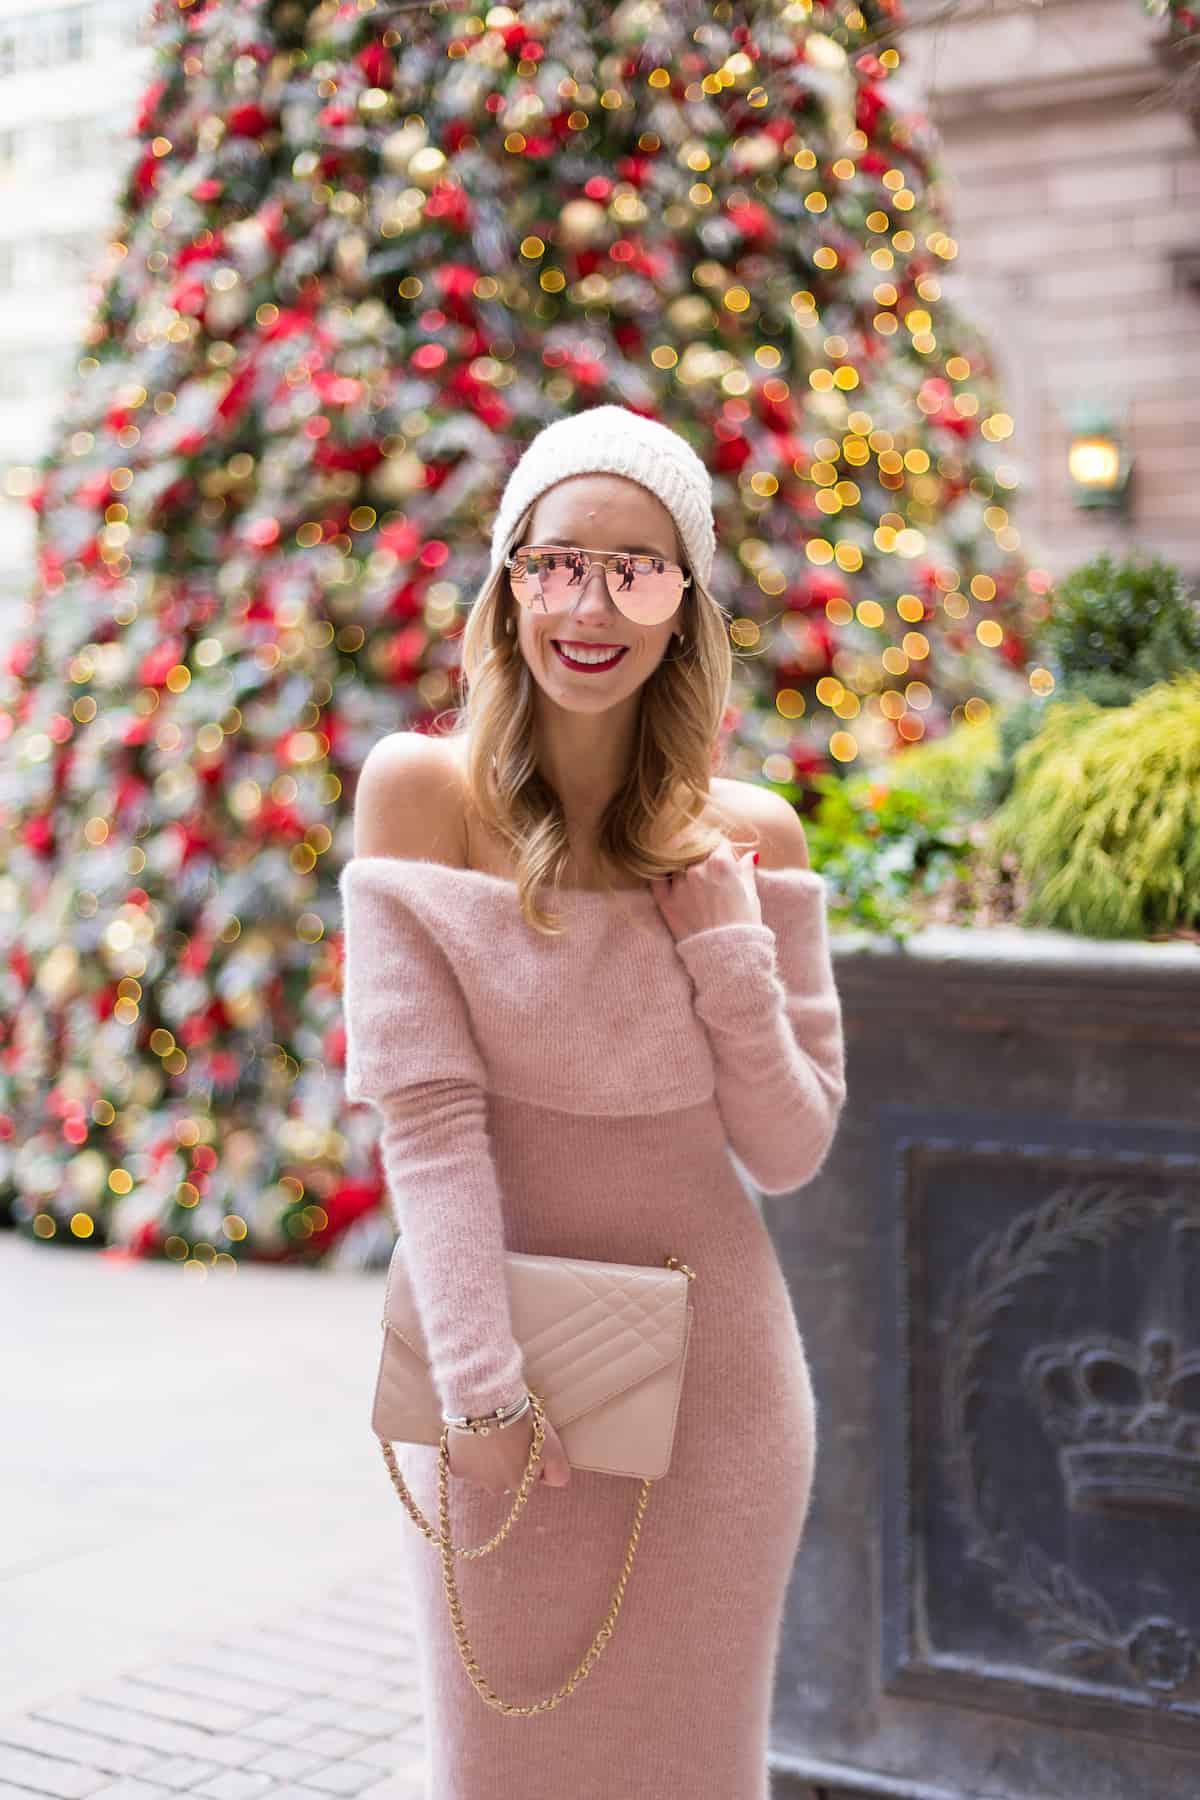 deb03926dd8 Pink Off The Shoulder Sweater Dress Pink Off The Shoulder Sweater Dress